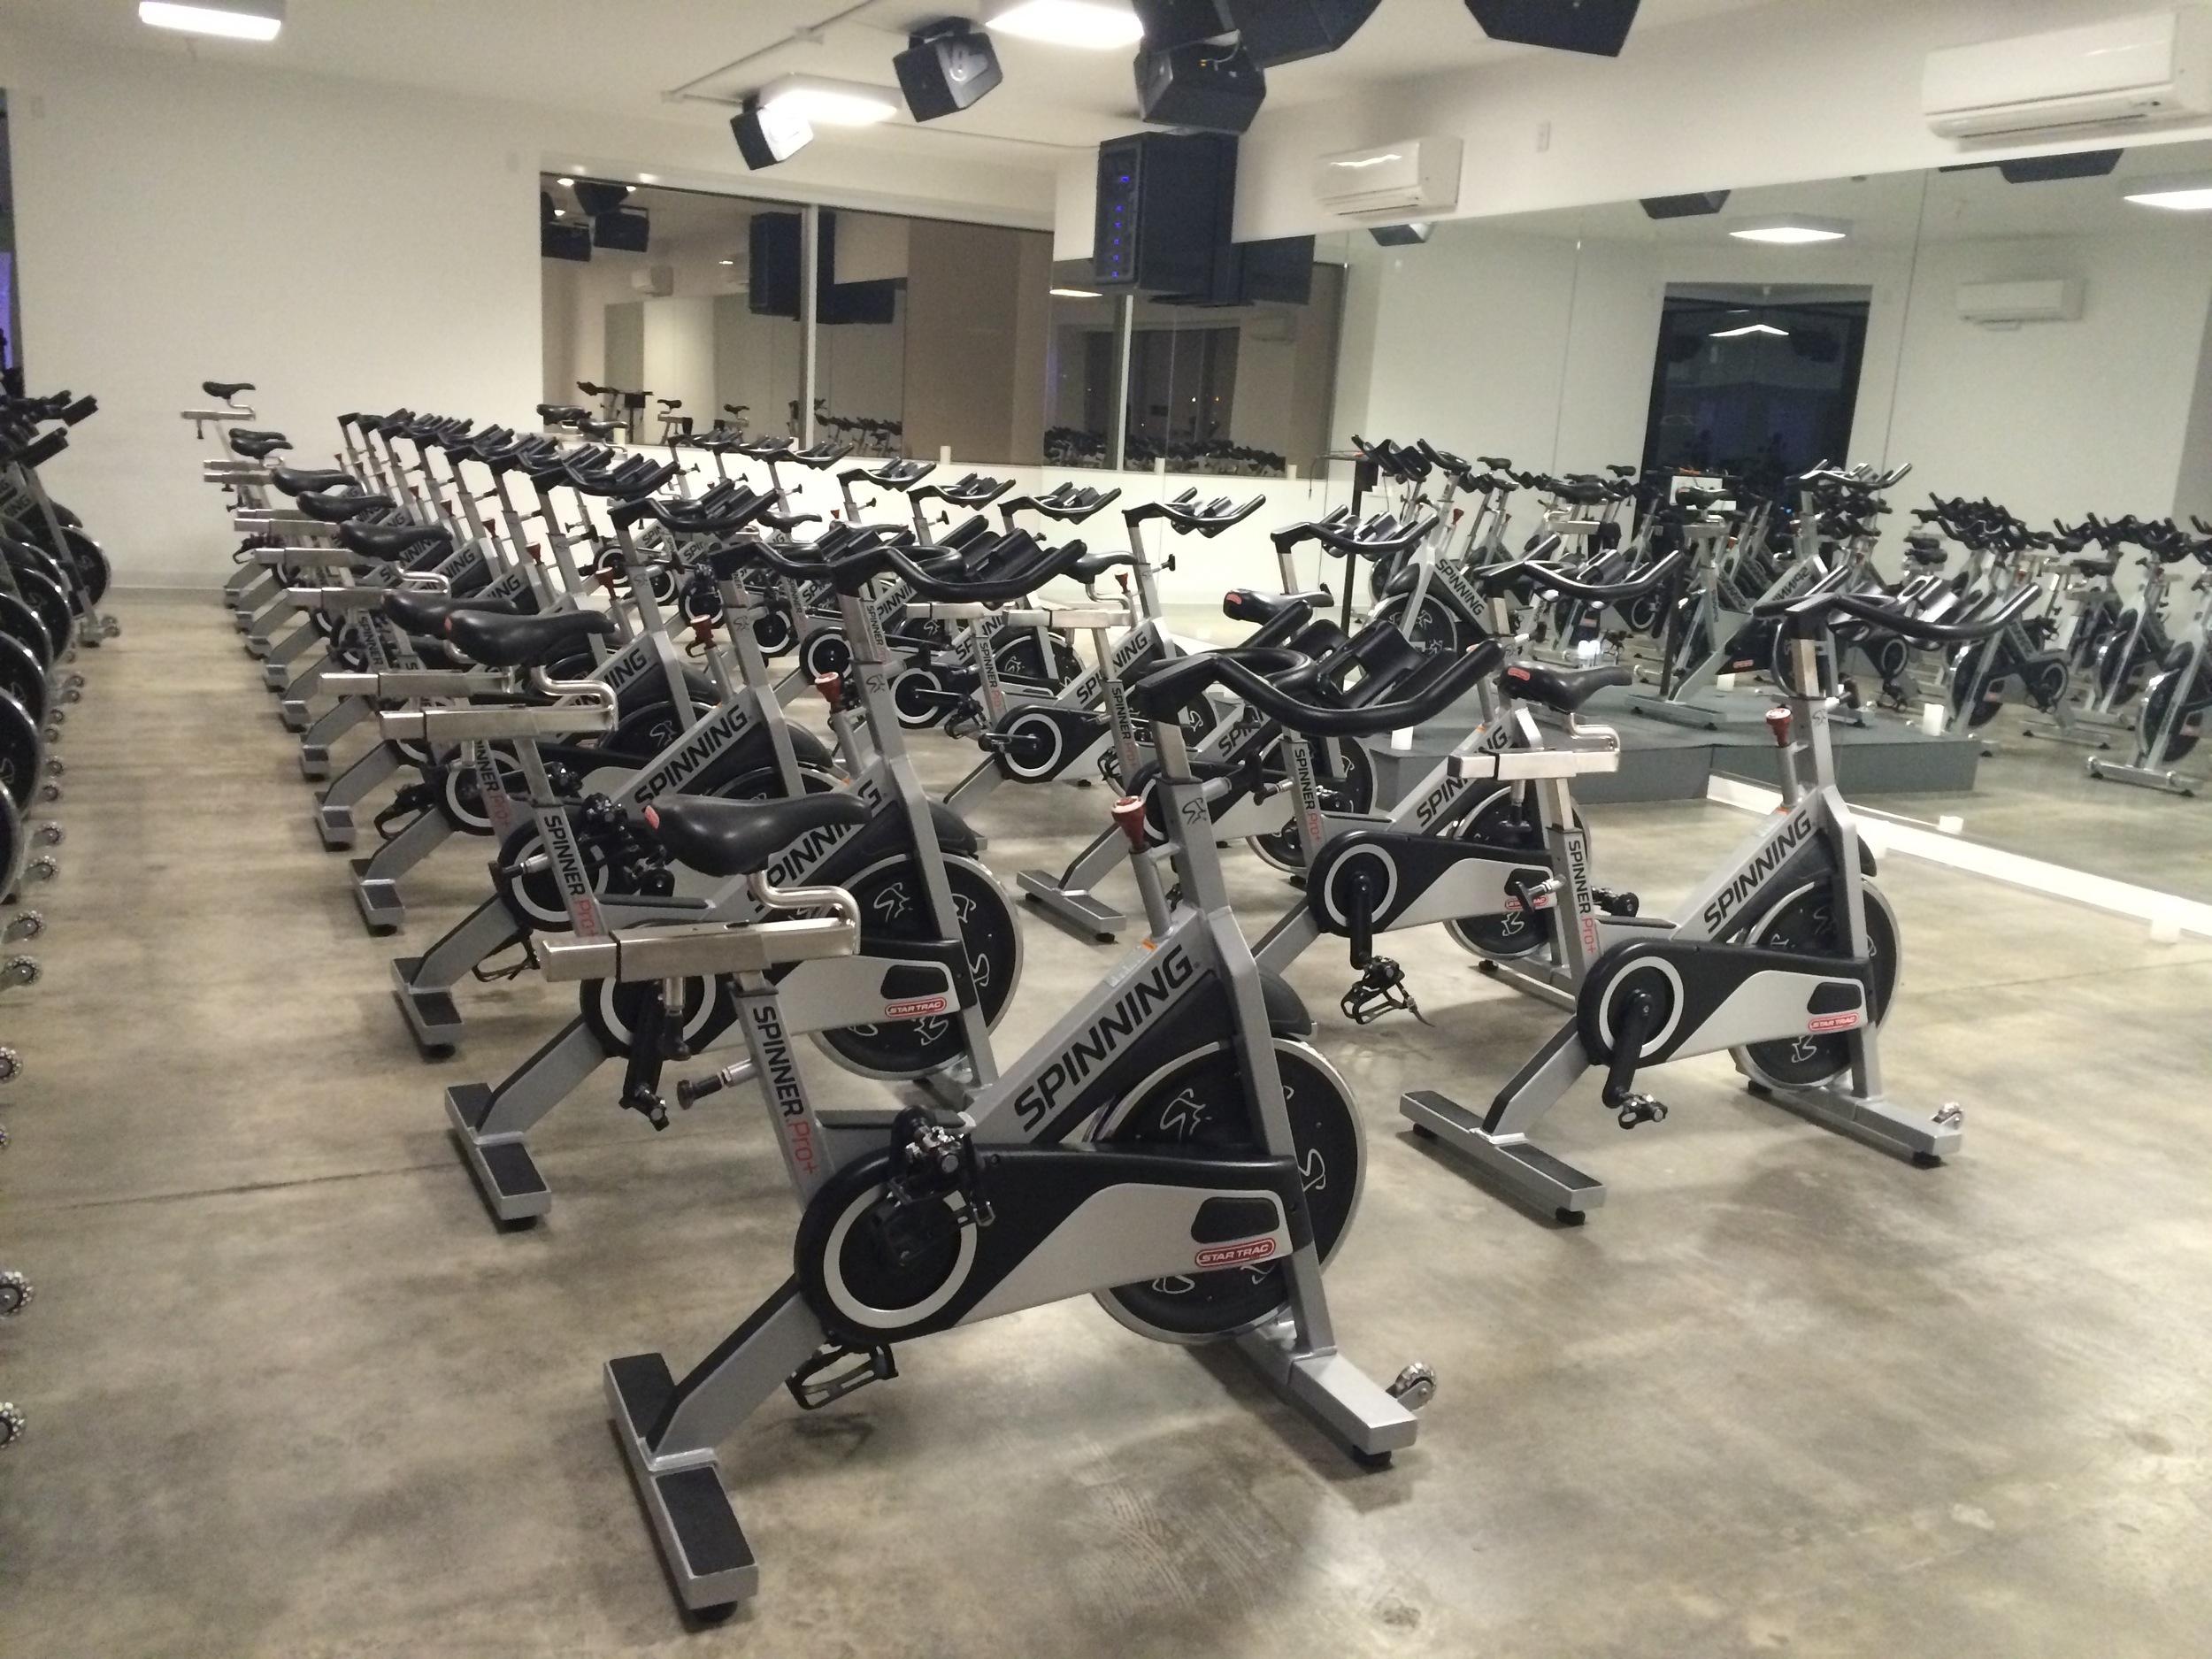 YogaCycle 2015 Manhattan Beach Blvd, Suite #110, Redondo Beach, CA 90278